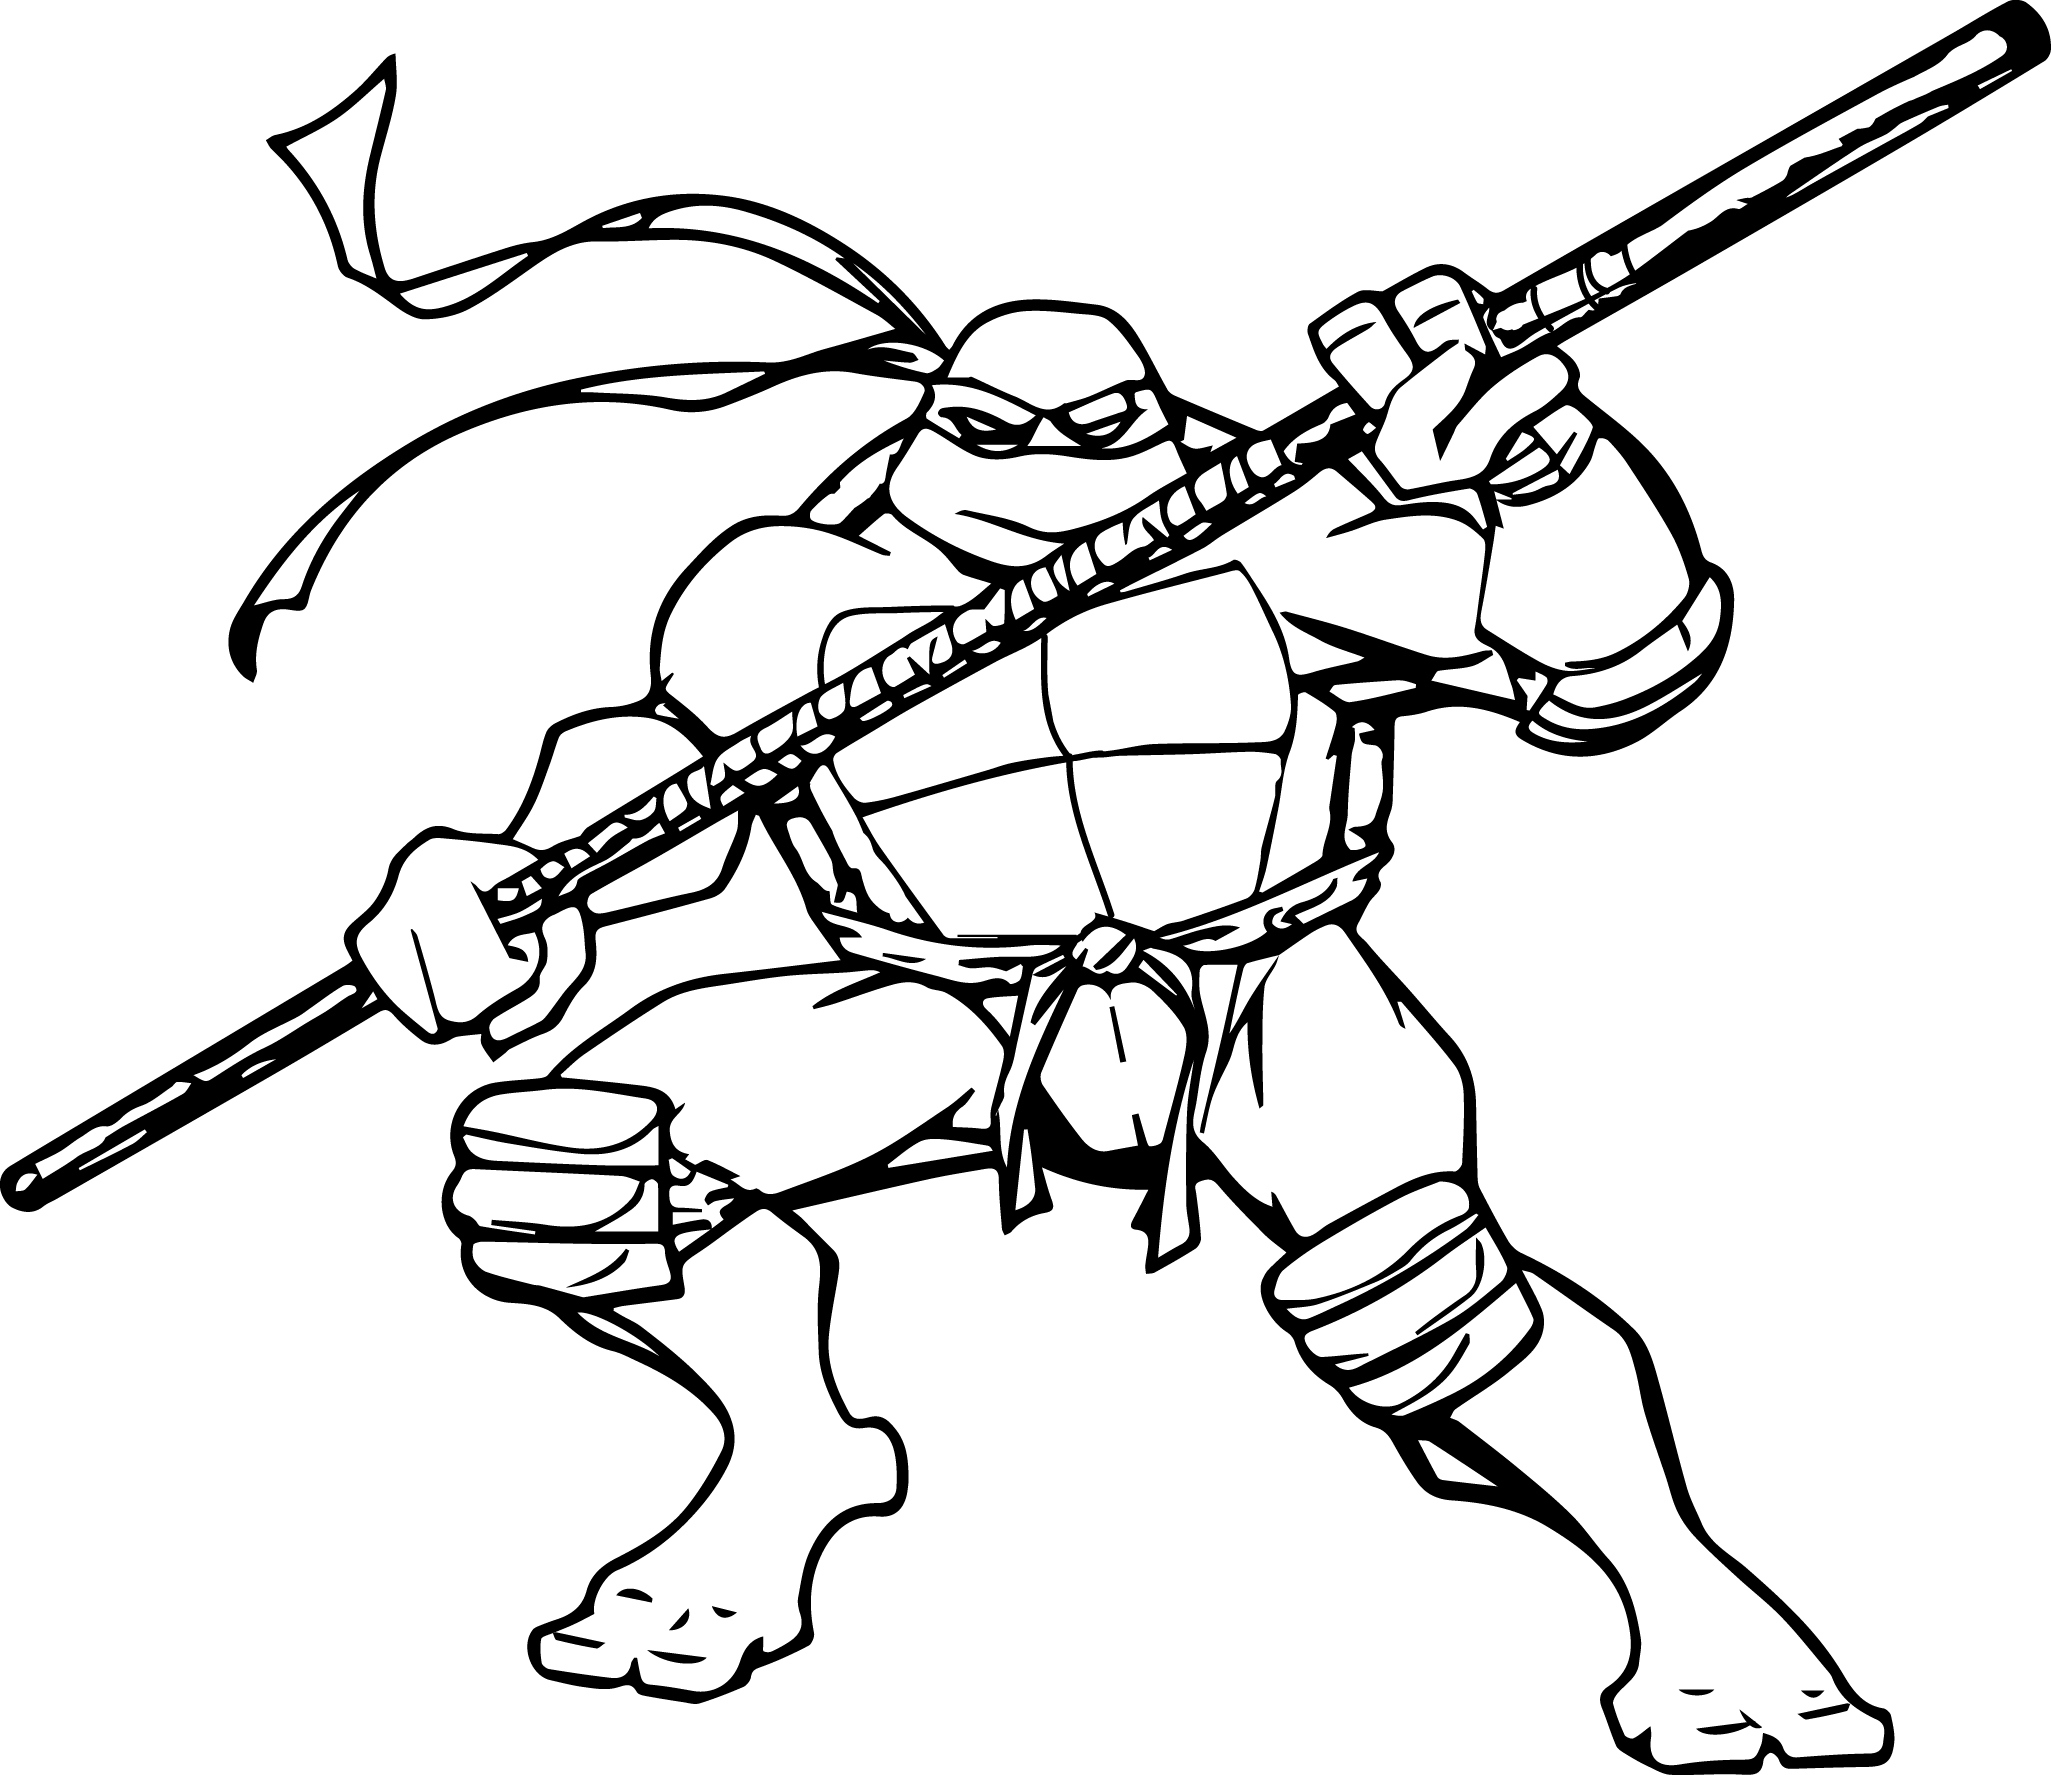 2051x1775 Teenage Mutant Ninja Turtles Coloring Pages Lovely Teenage Mutant